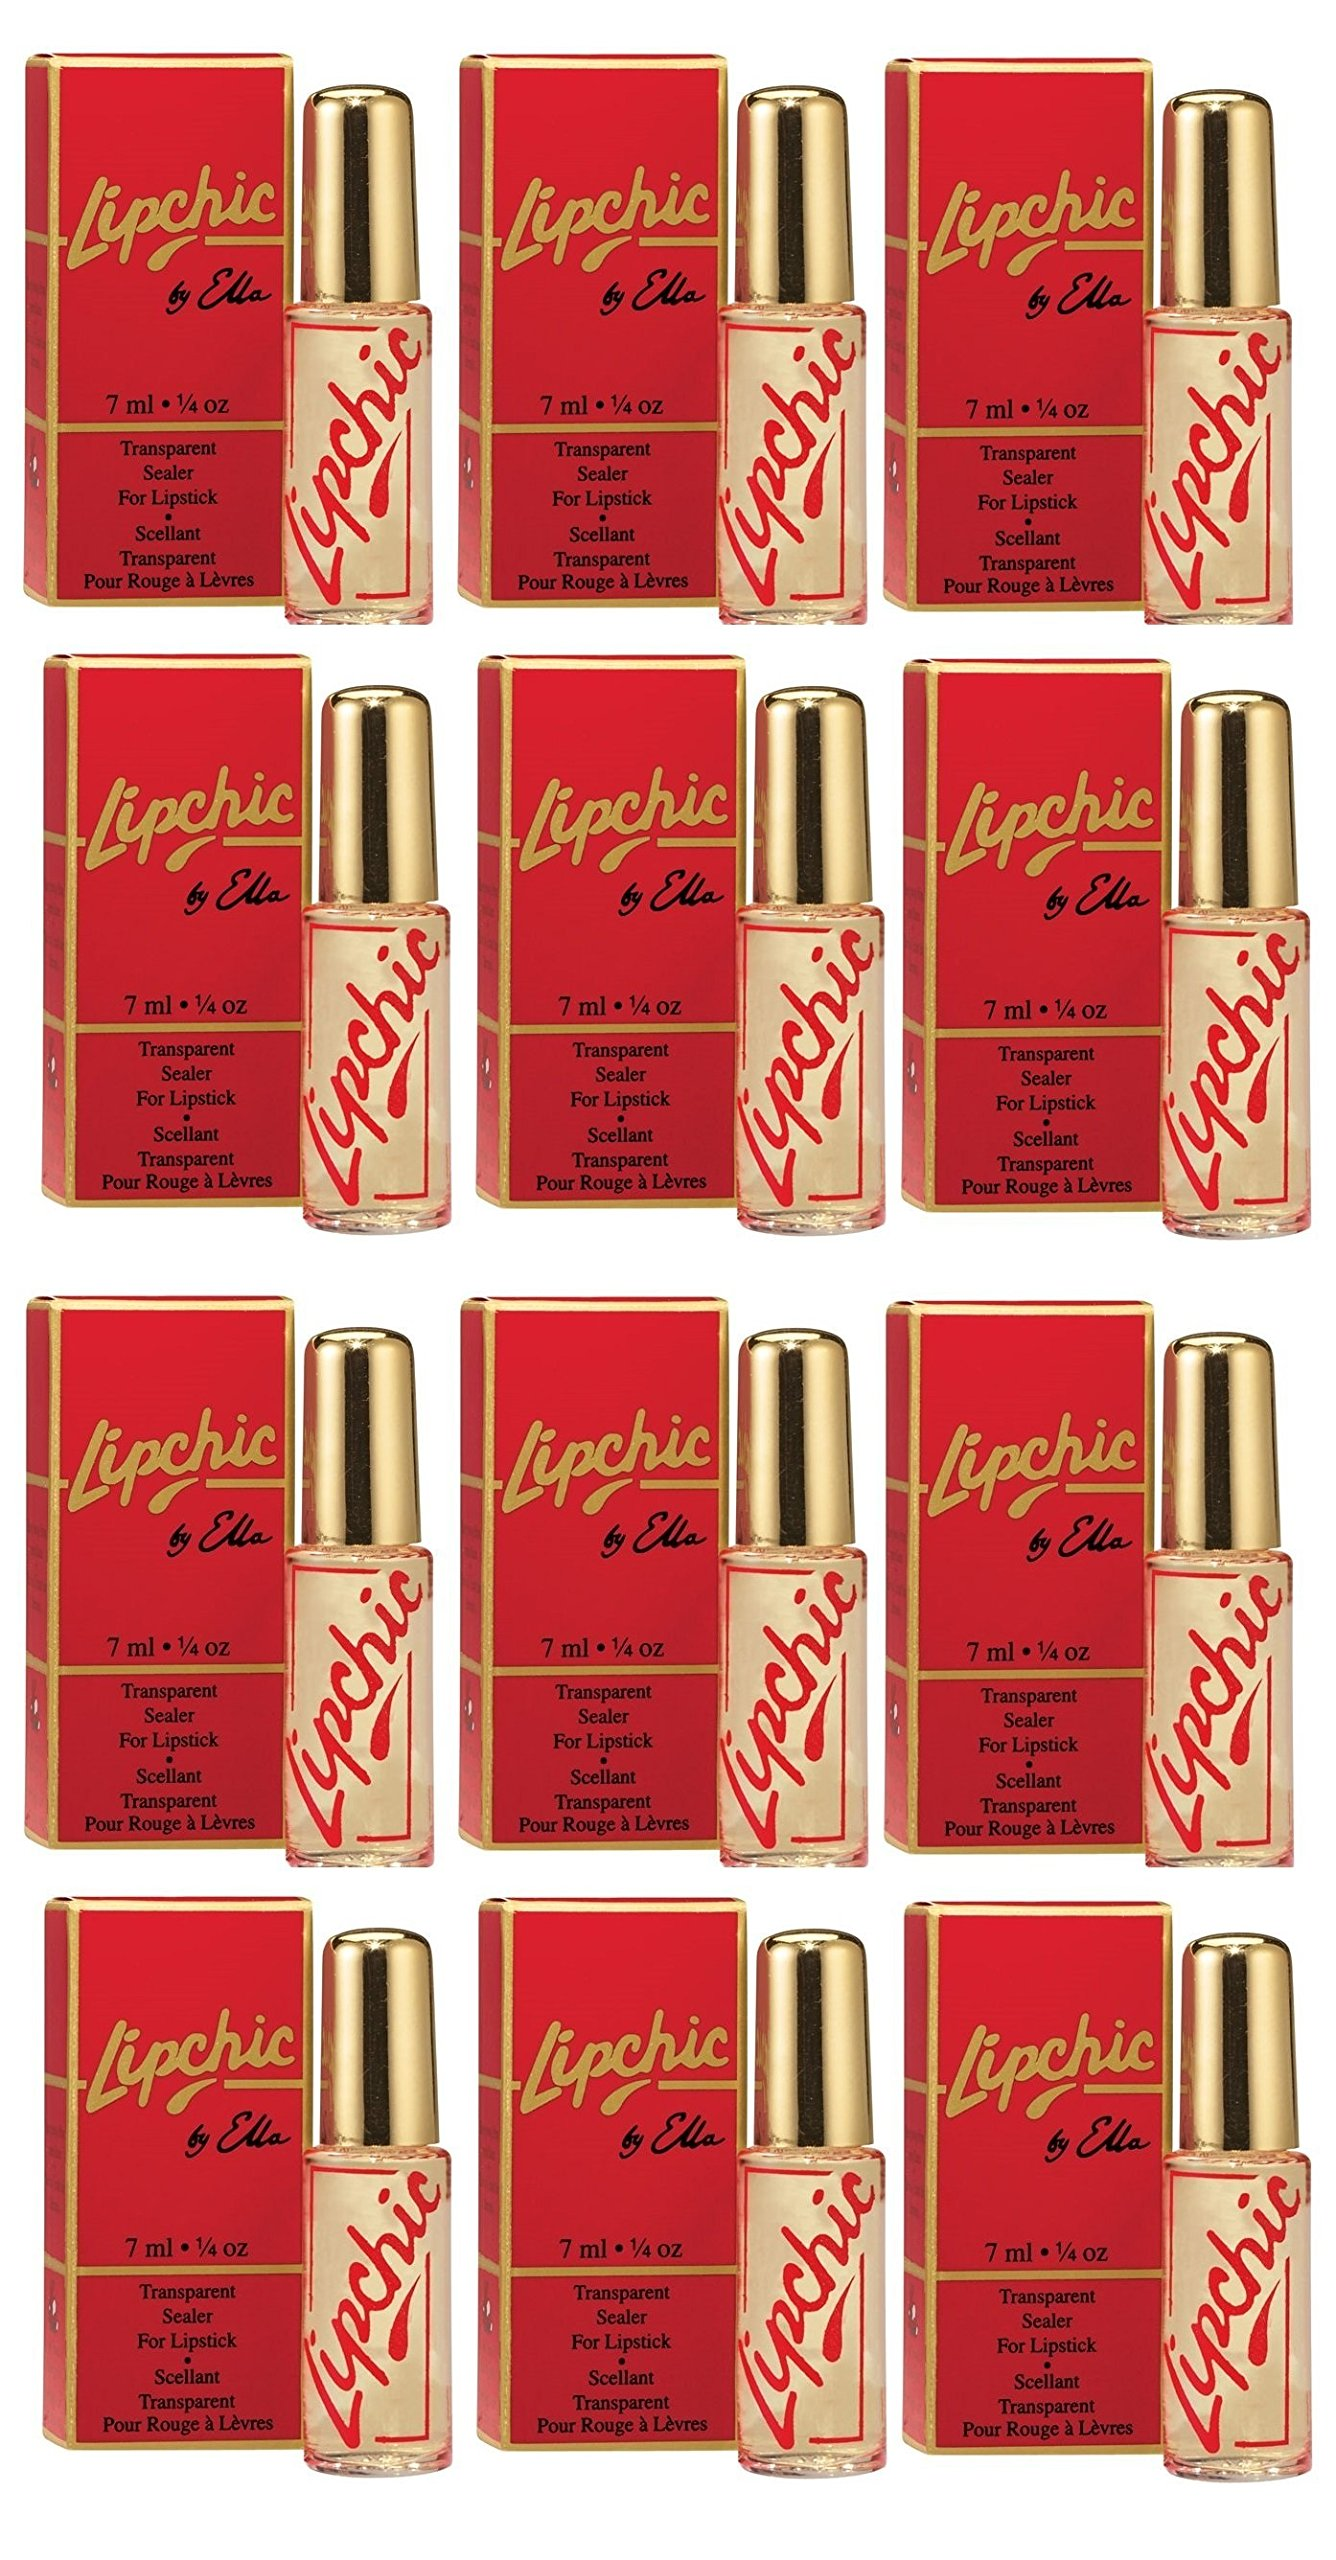 12 Lipchic Lipstick Sealers